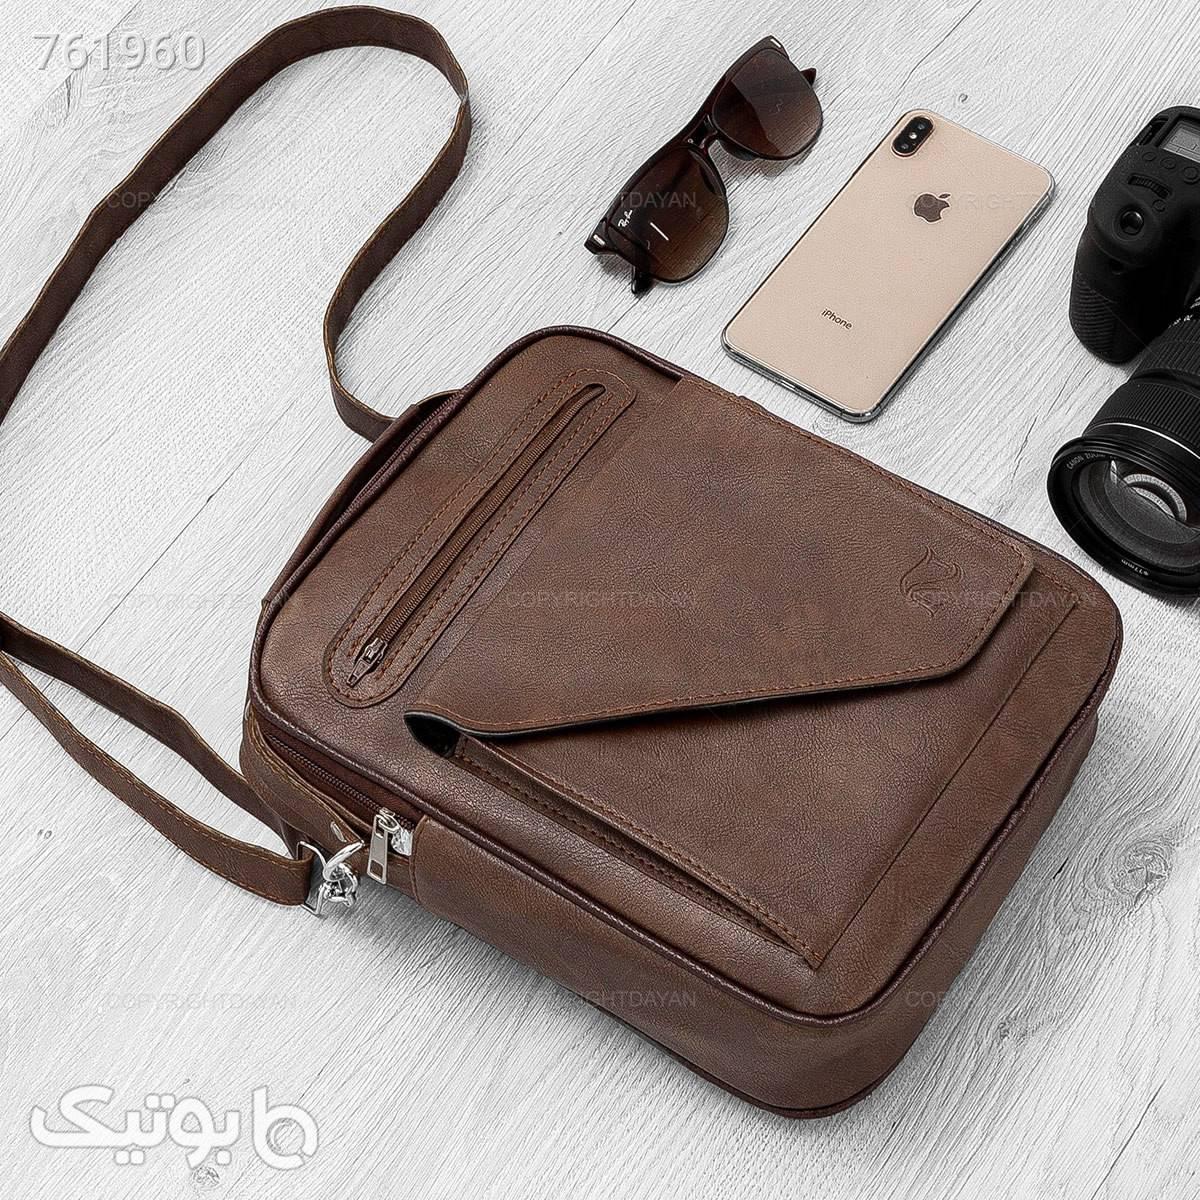 کیف مردانه نایک  قهوه ای كيف مردانه